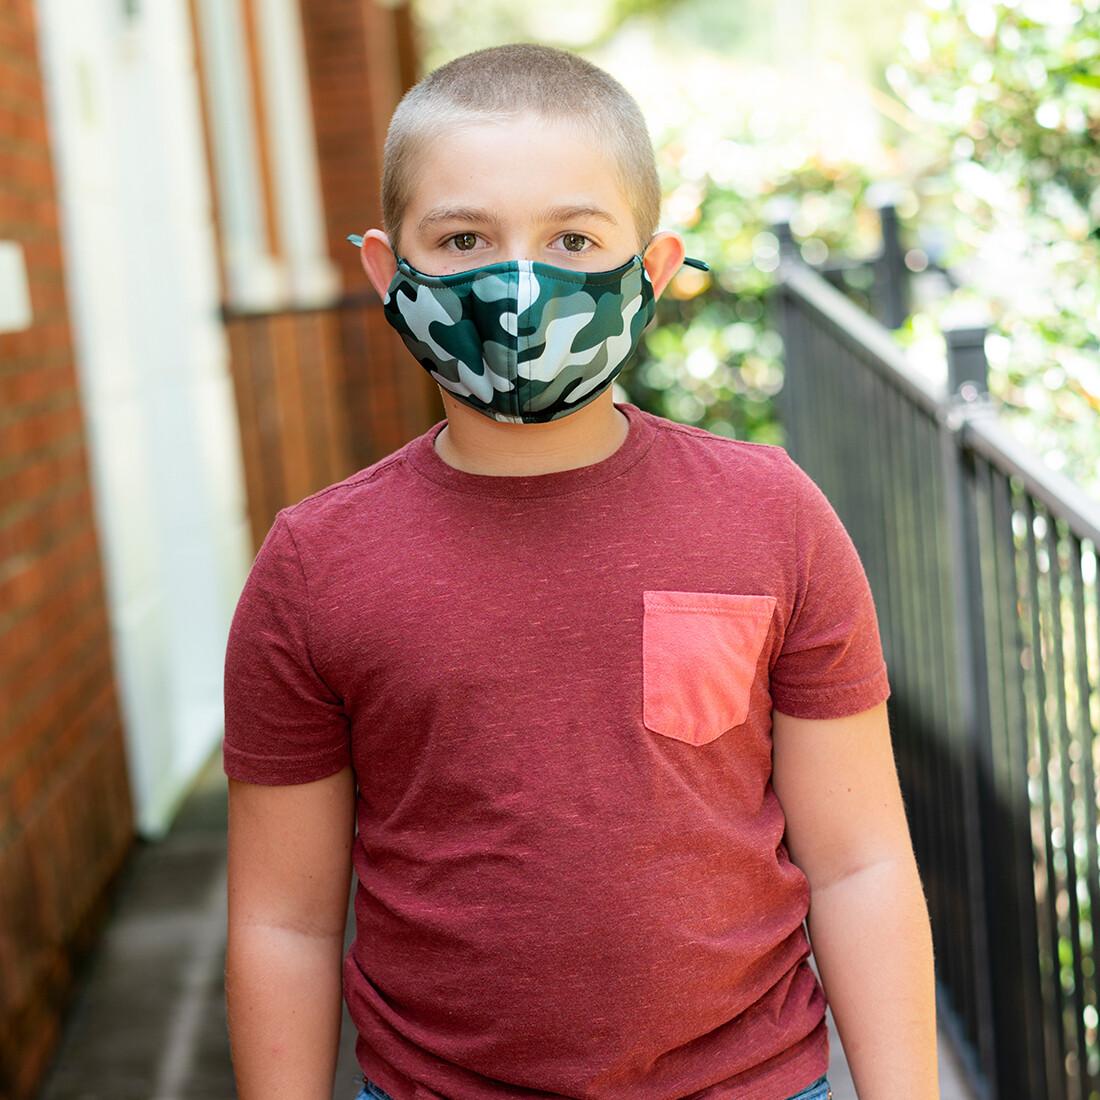 Camo Adjustable Kids' Face Mask